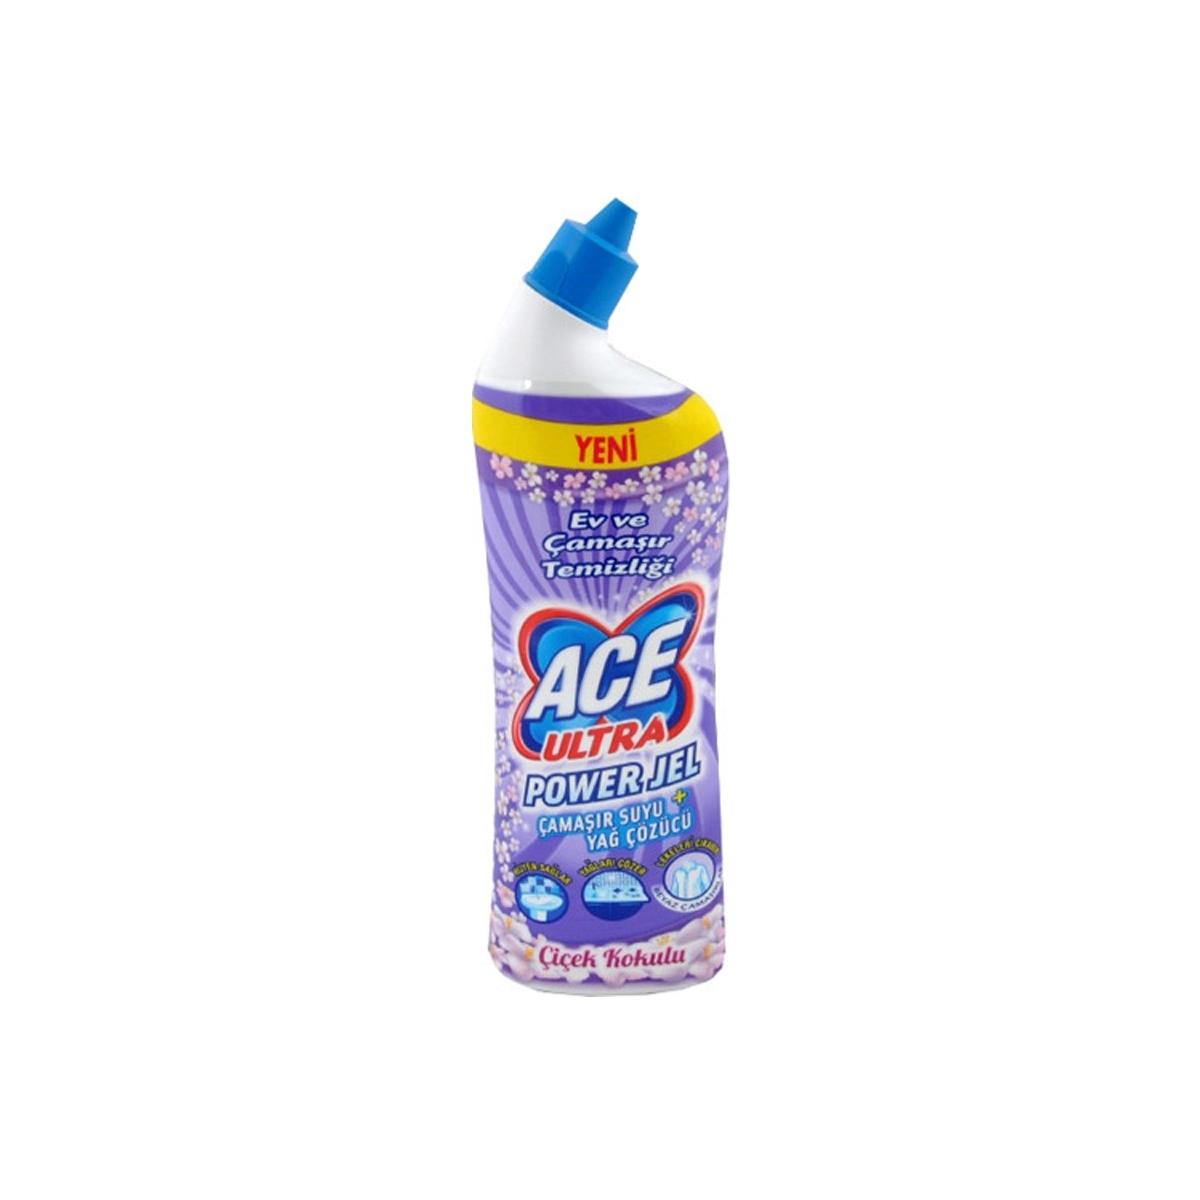 Ace Ultra Power Jel Çiçek Kokulu 810 ml 12'li Koli resmi